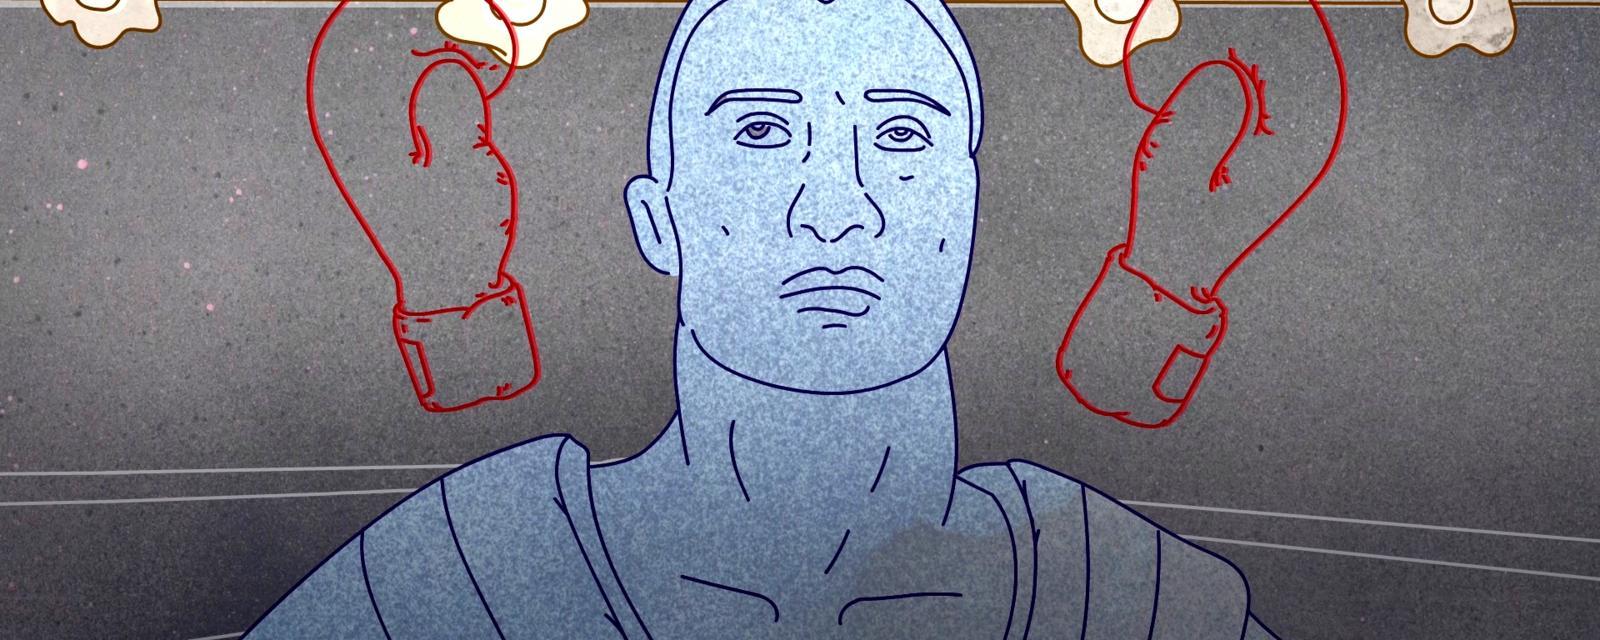 A world heavyweight champ's guide to failure